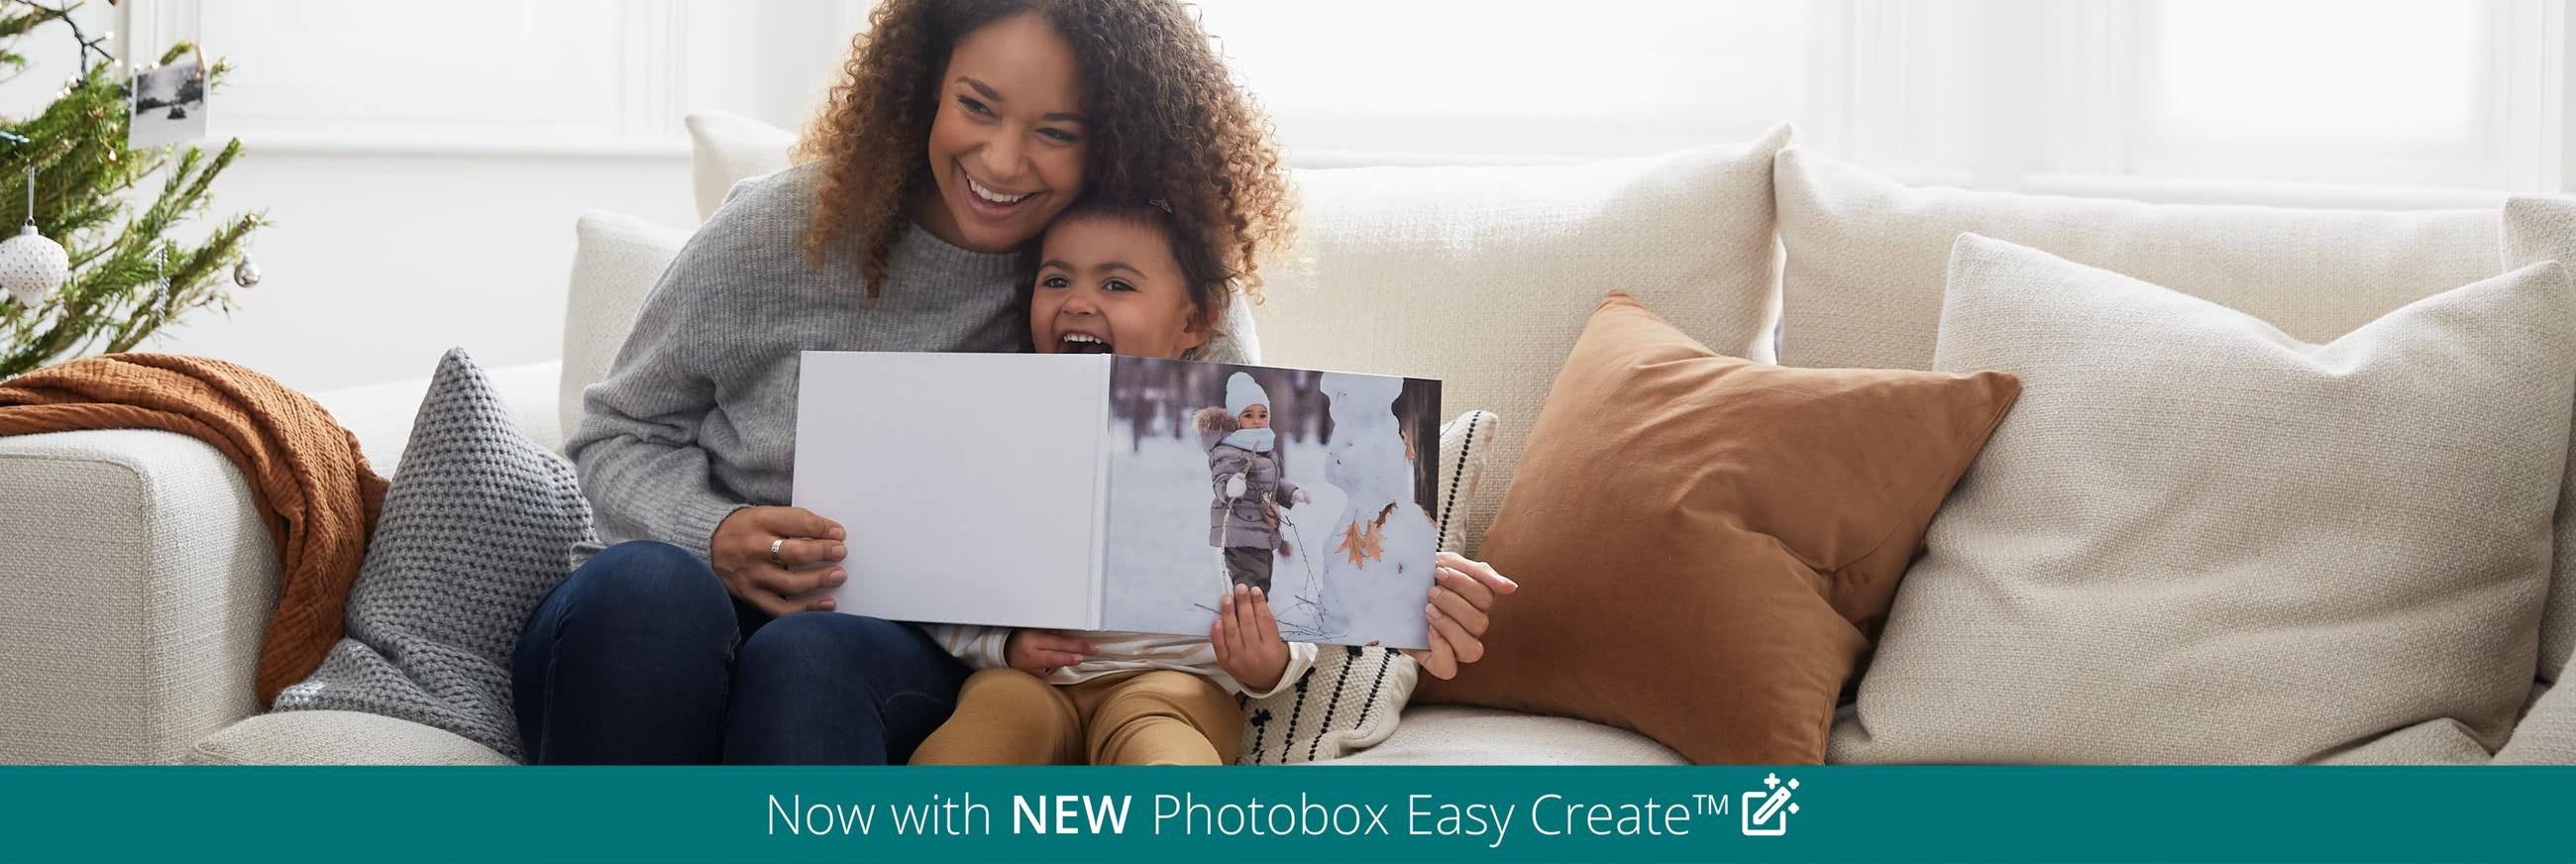 A4 & A3 Standard Hardcover Photo Books